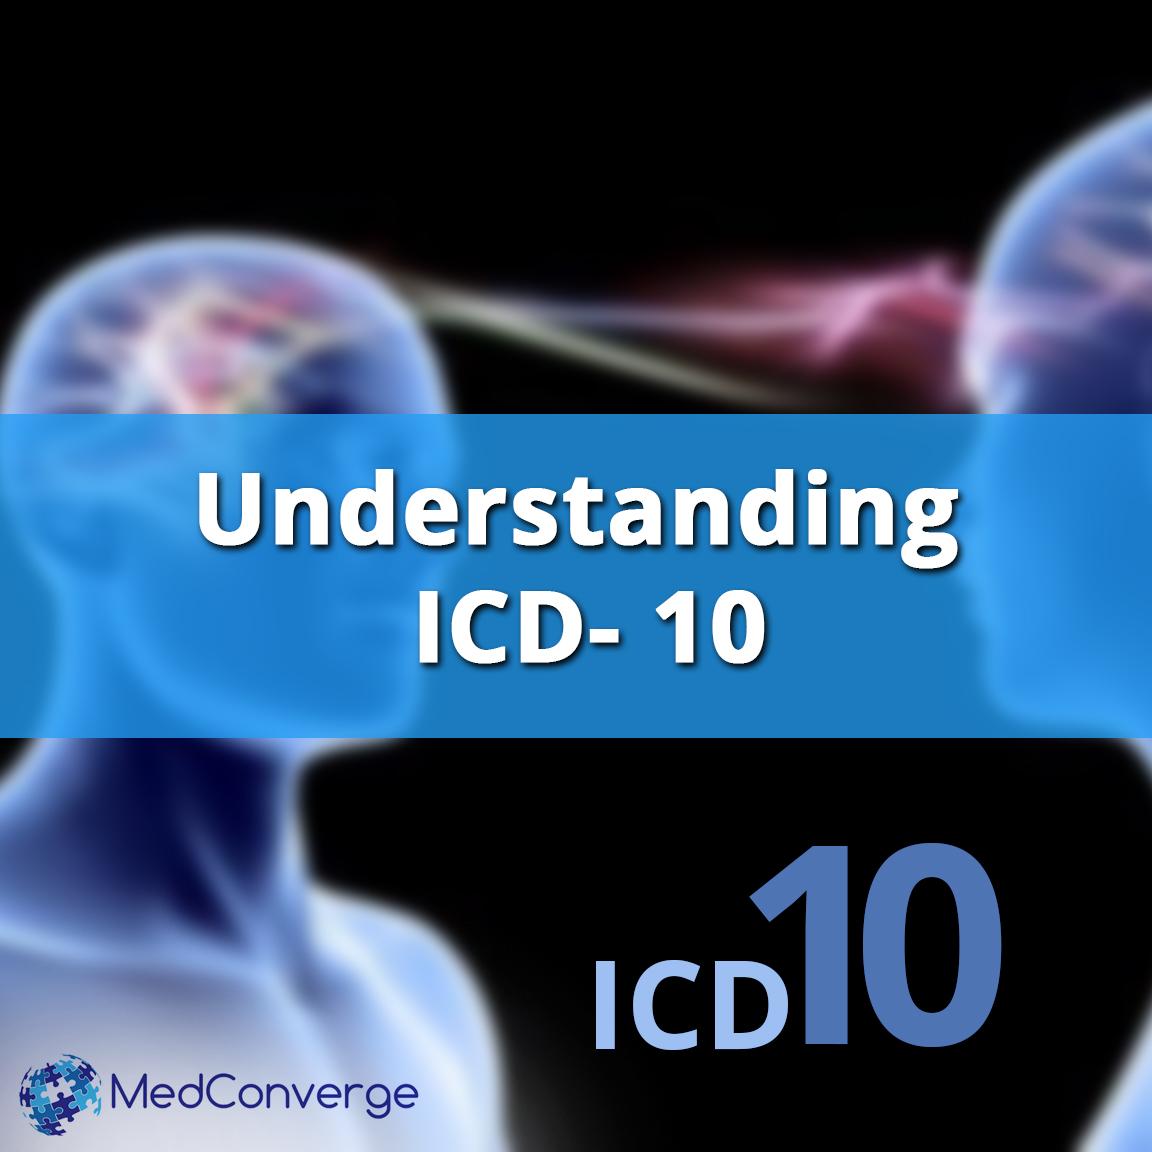 Understanding ICD- 10 coding